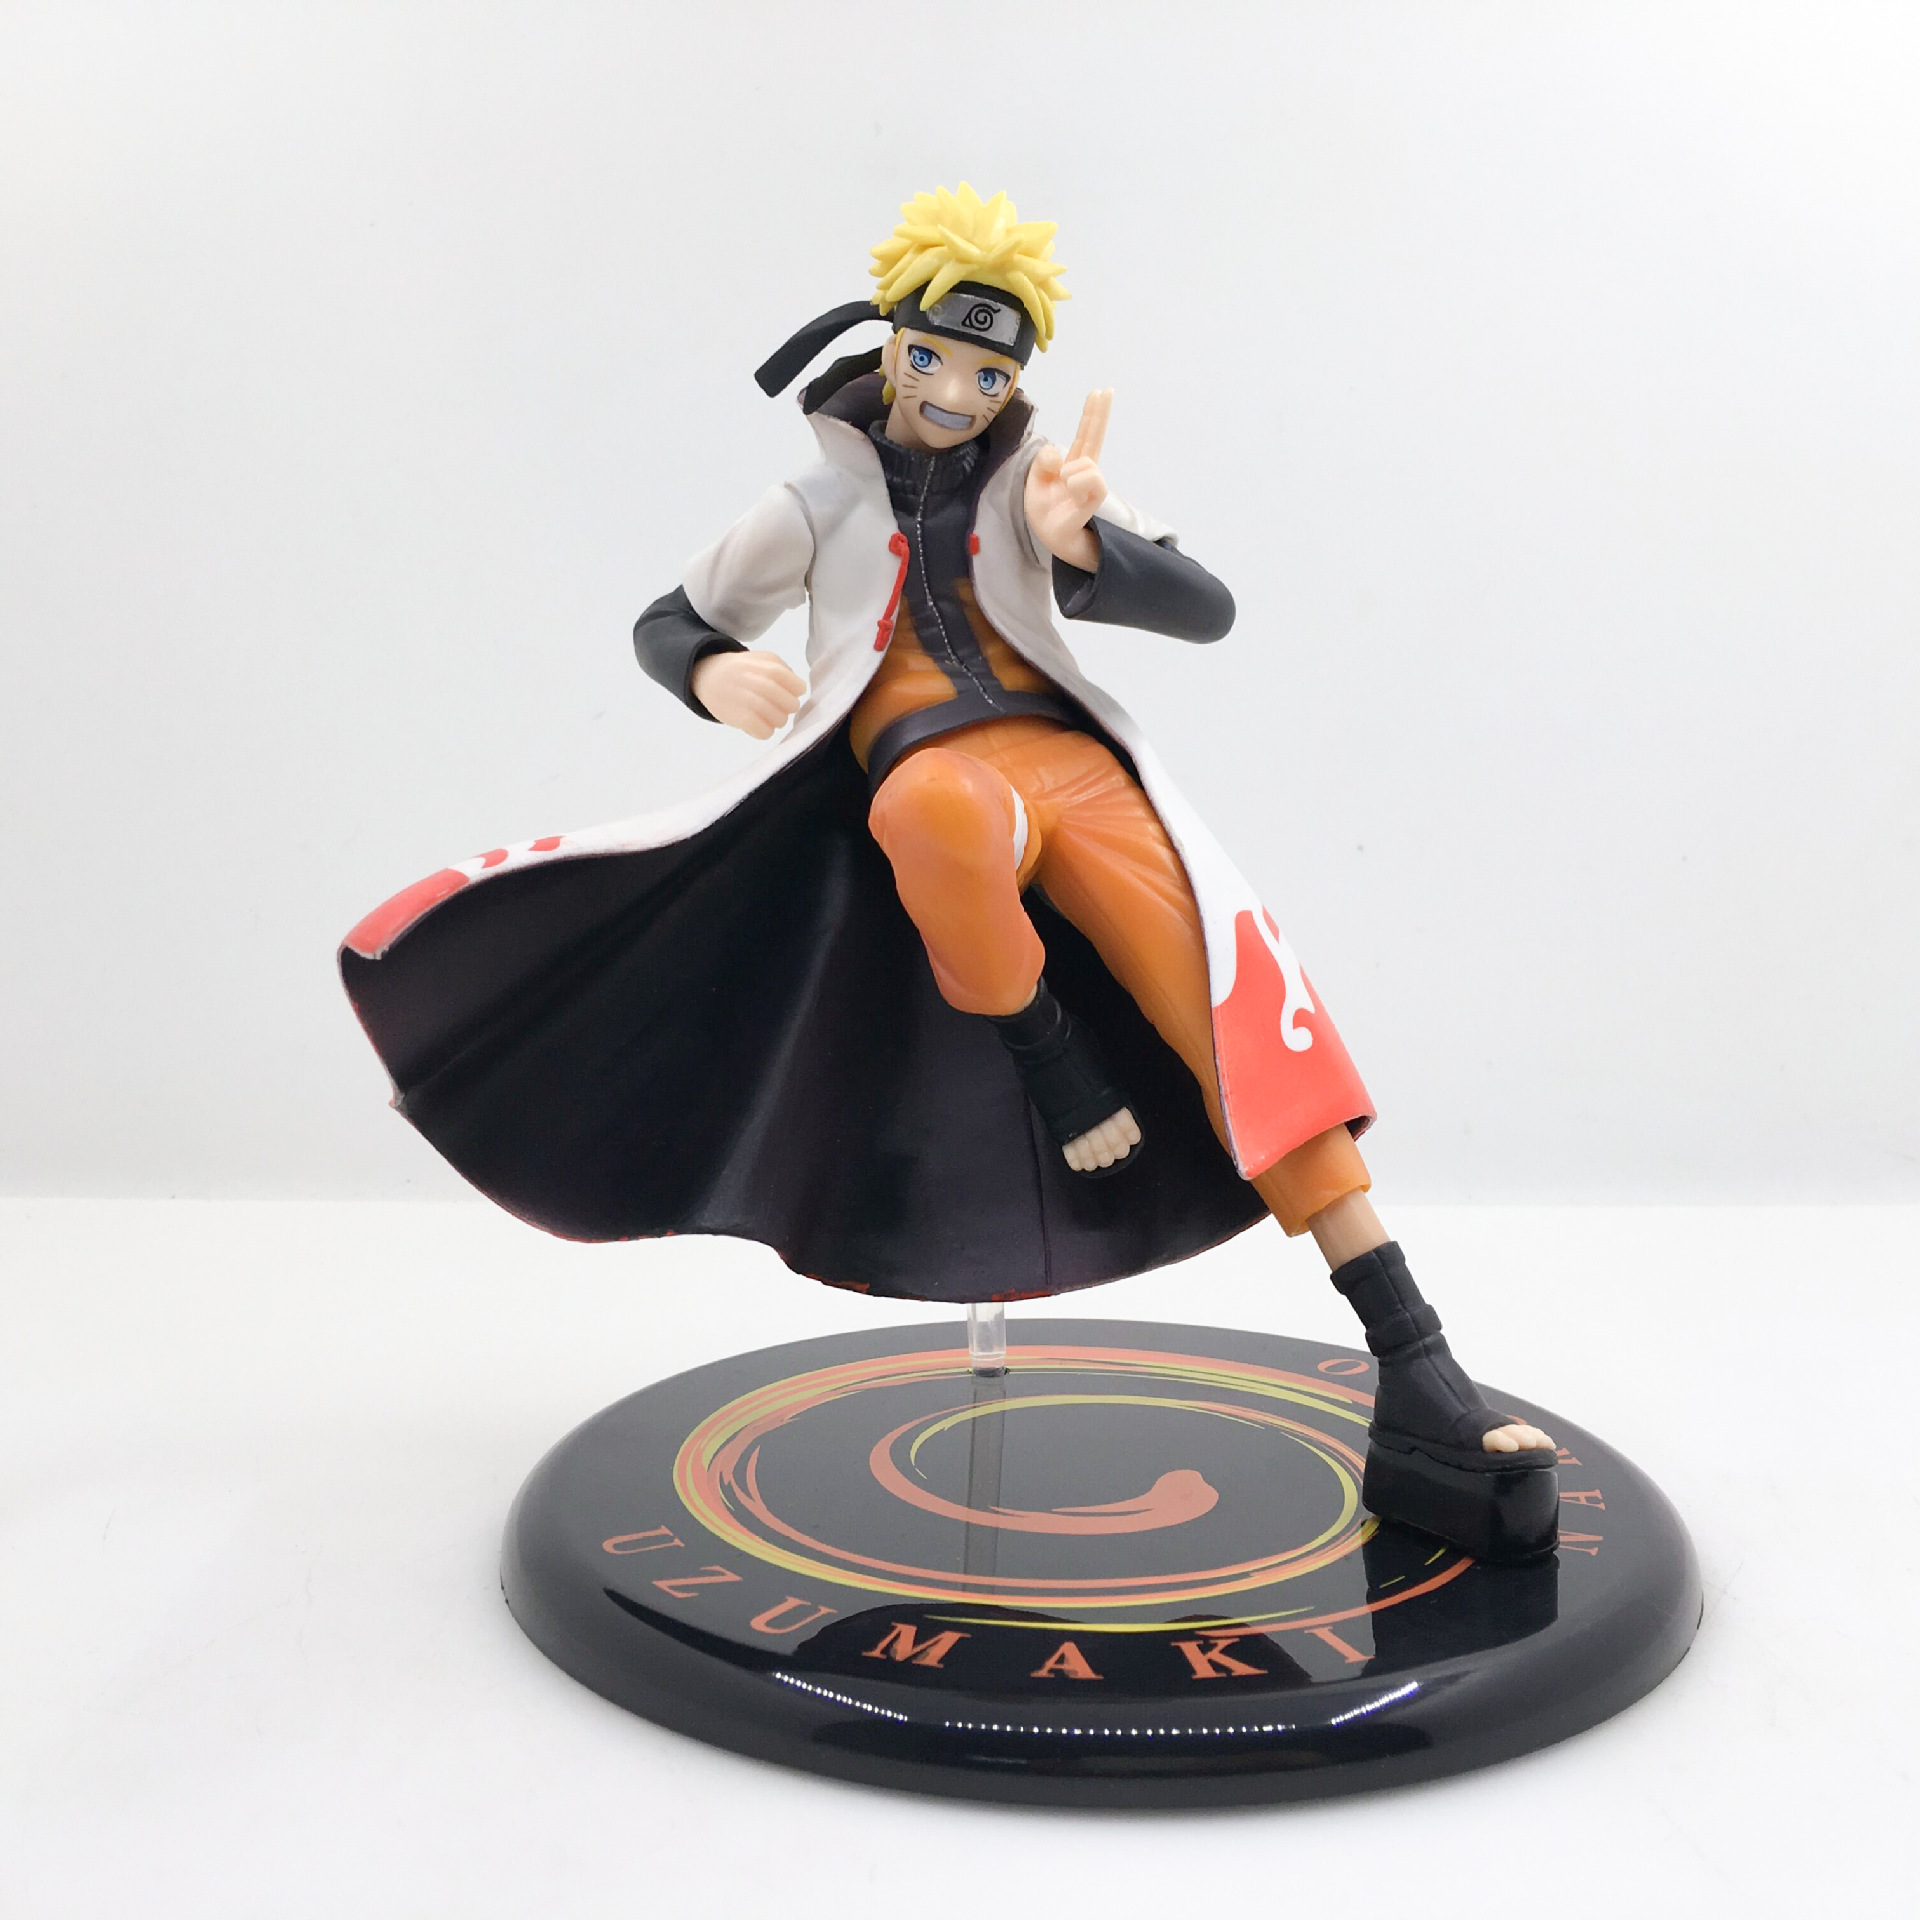 17cm Naruto Shippuden Uzumaki Naruto Yondaime Face Changeable Ver Model Anime Action Figure Collection Lovely Decoration Doll